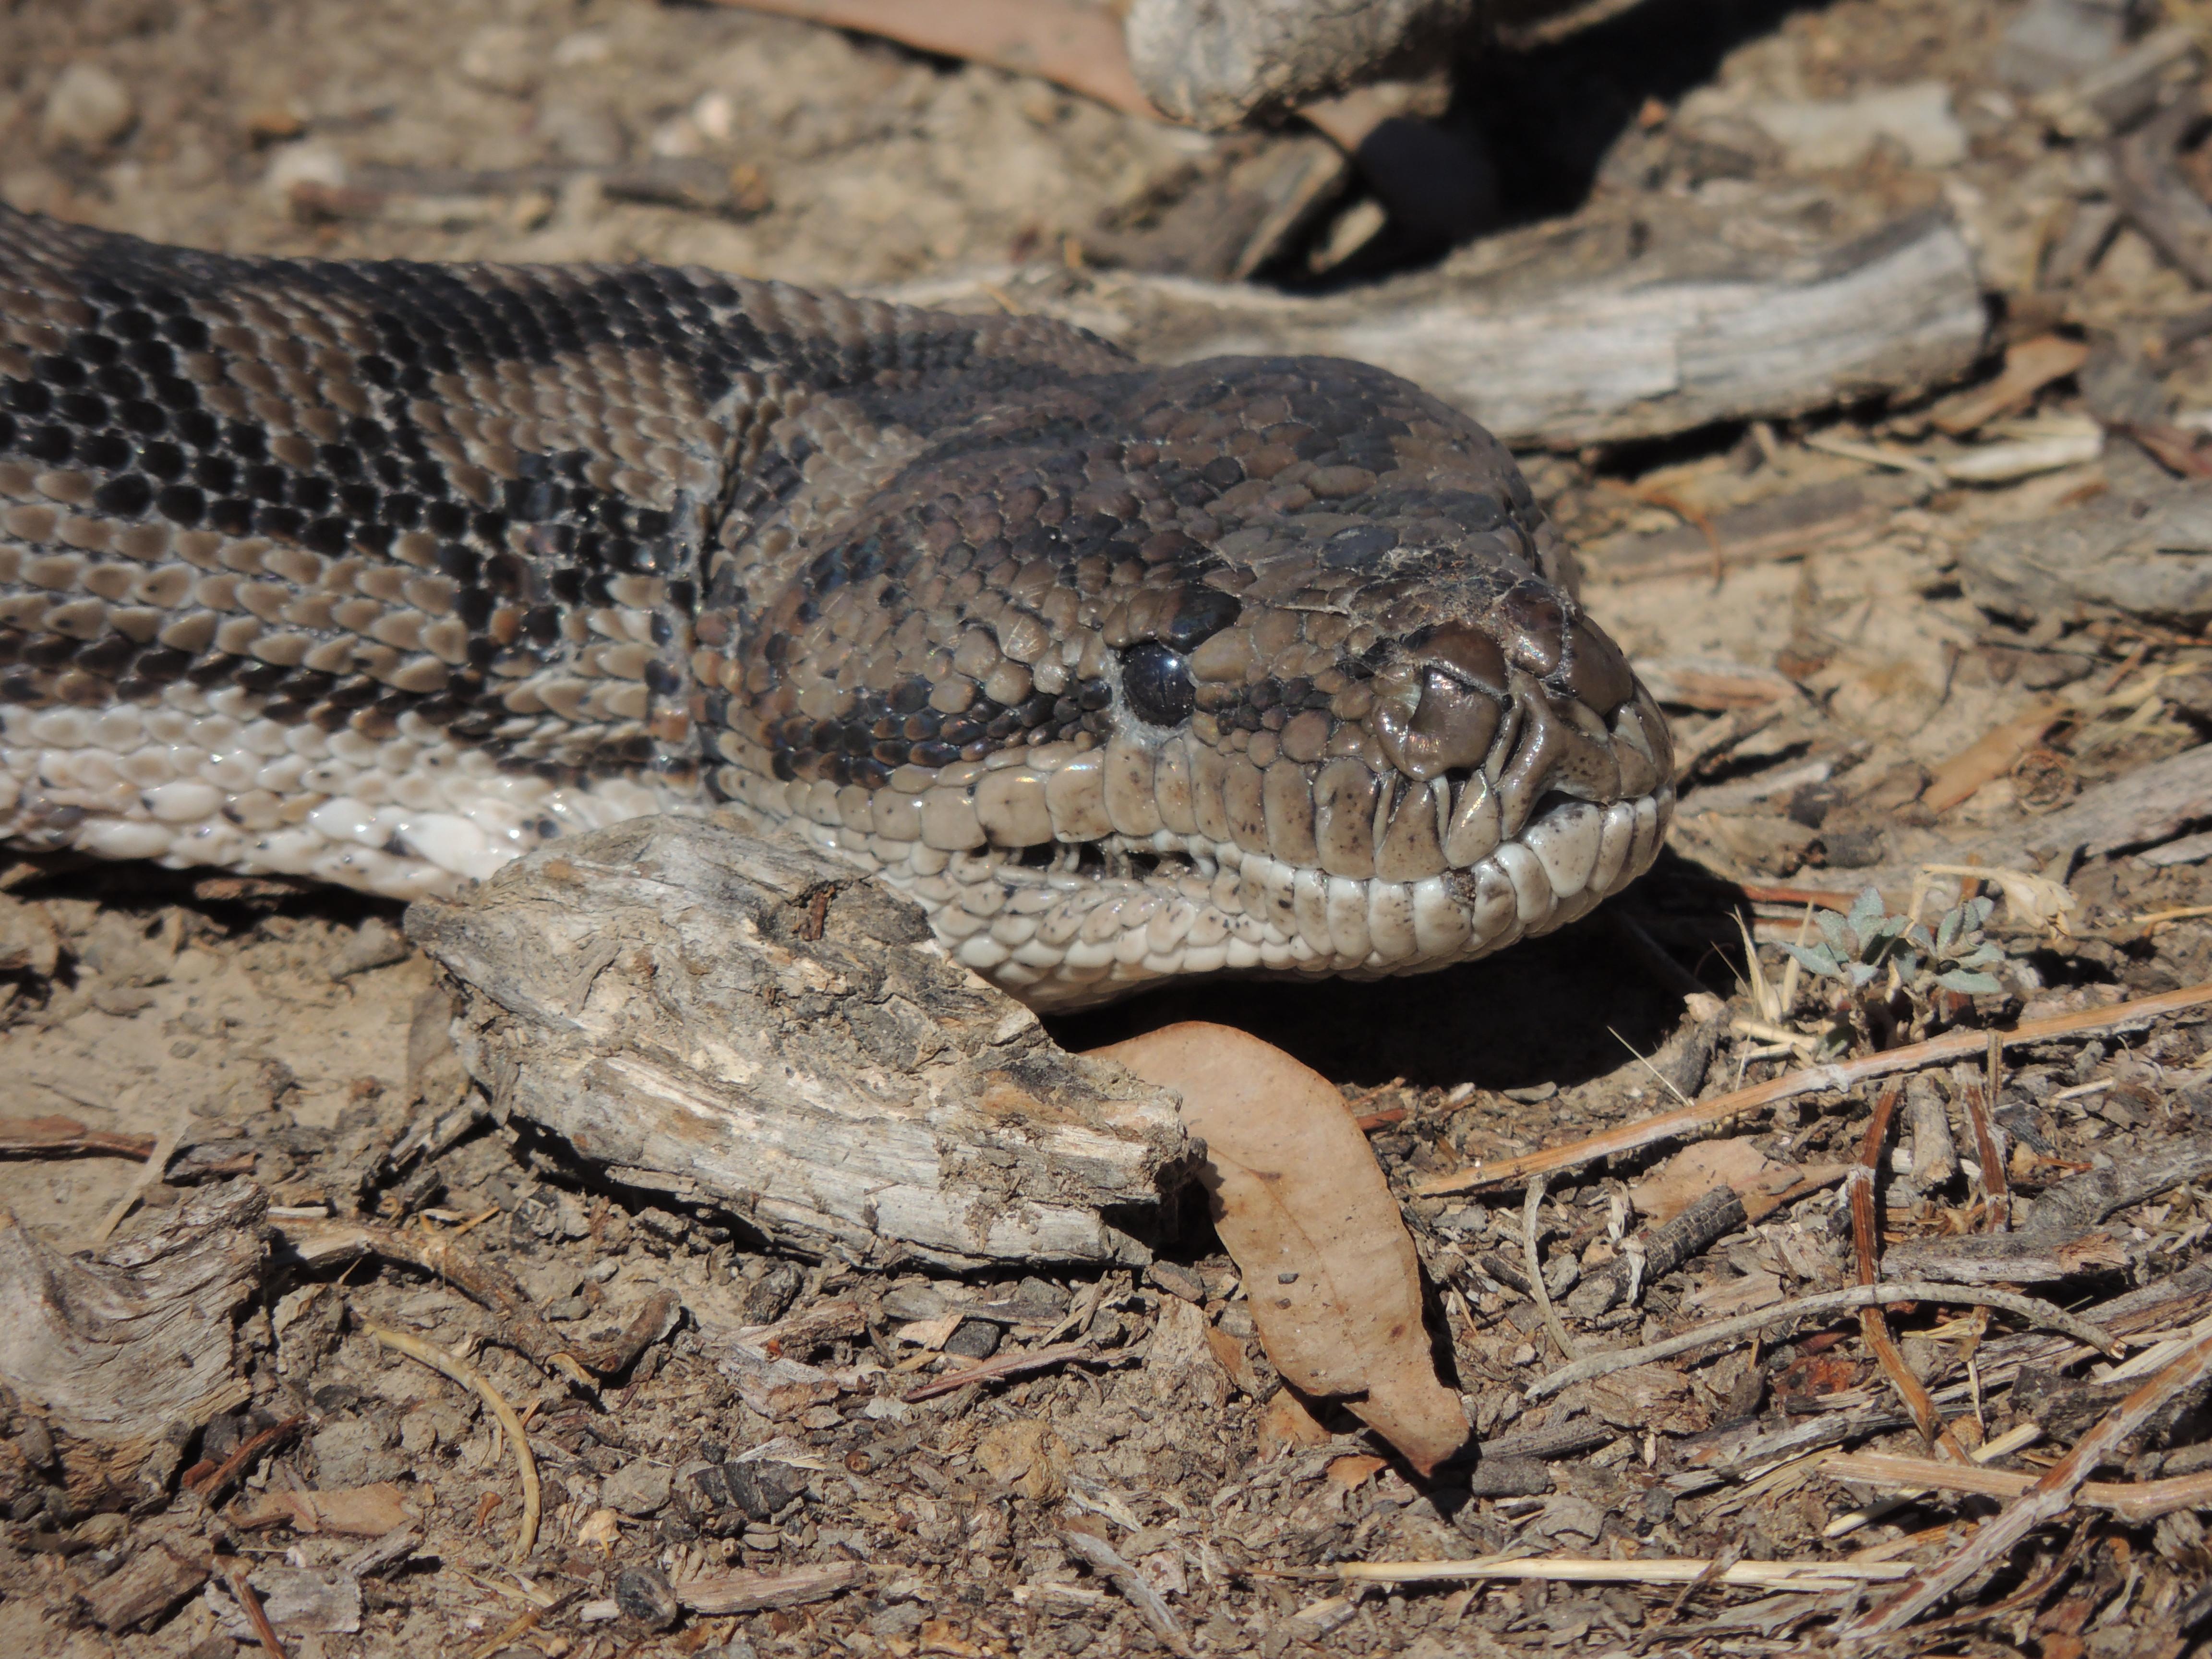 Carpet snake photo Michelle Morton